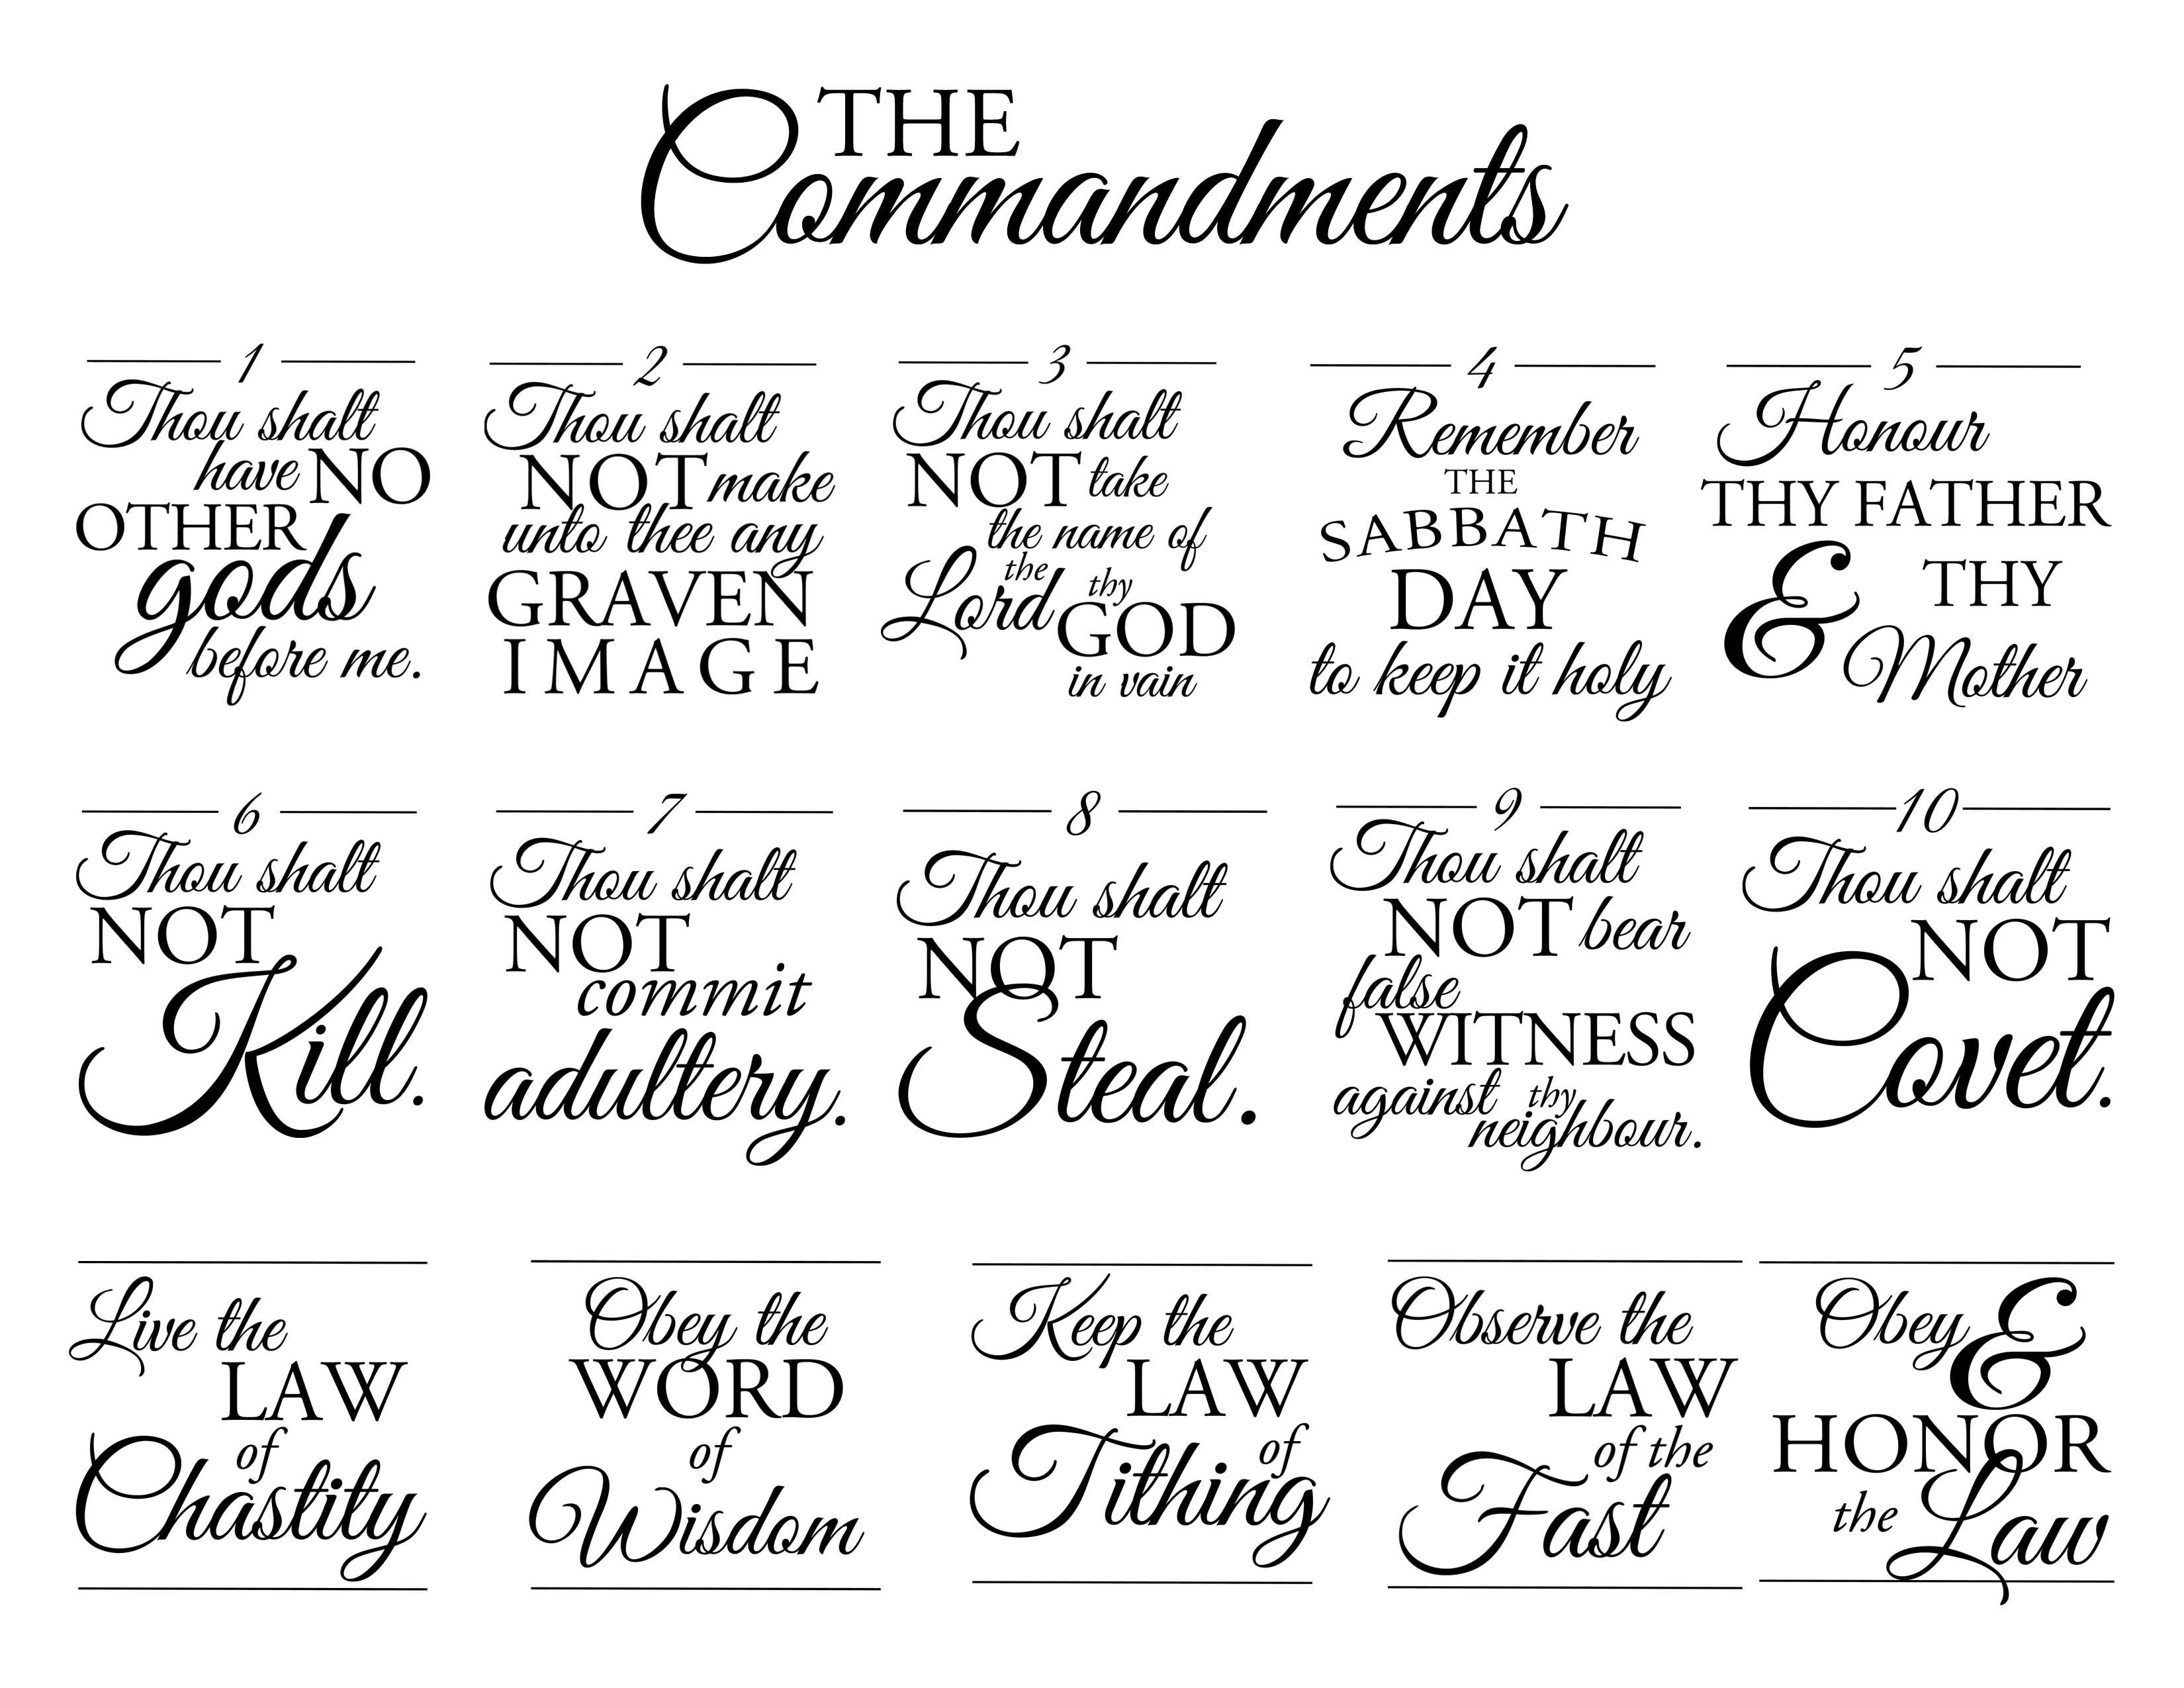 15 Best Images Of 10 Commandments Worksheet